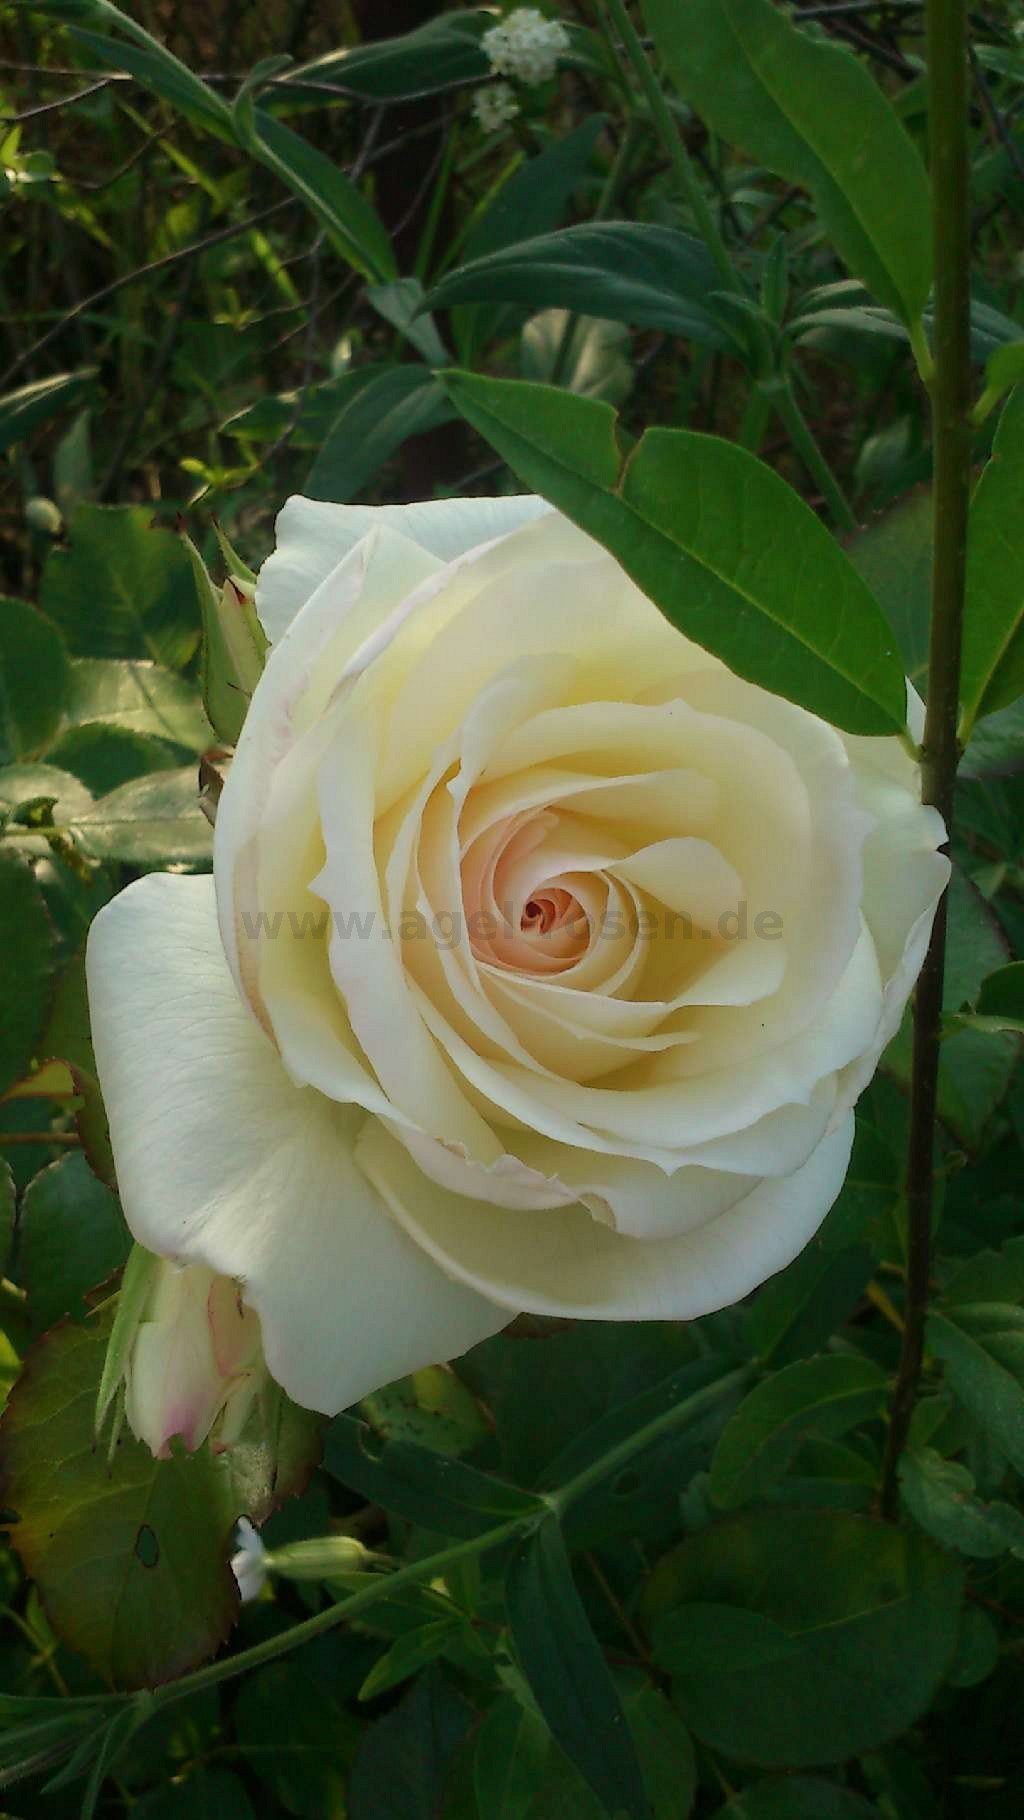 rose schneewalzer online kaufen agel rosen 1 5 liter. Black Bedroom Furniture Sets. Home Design Ideas